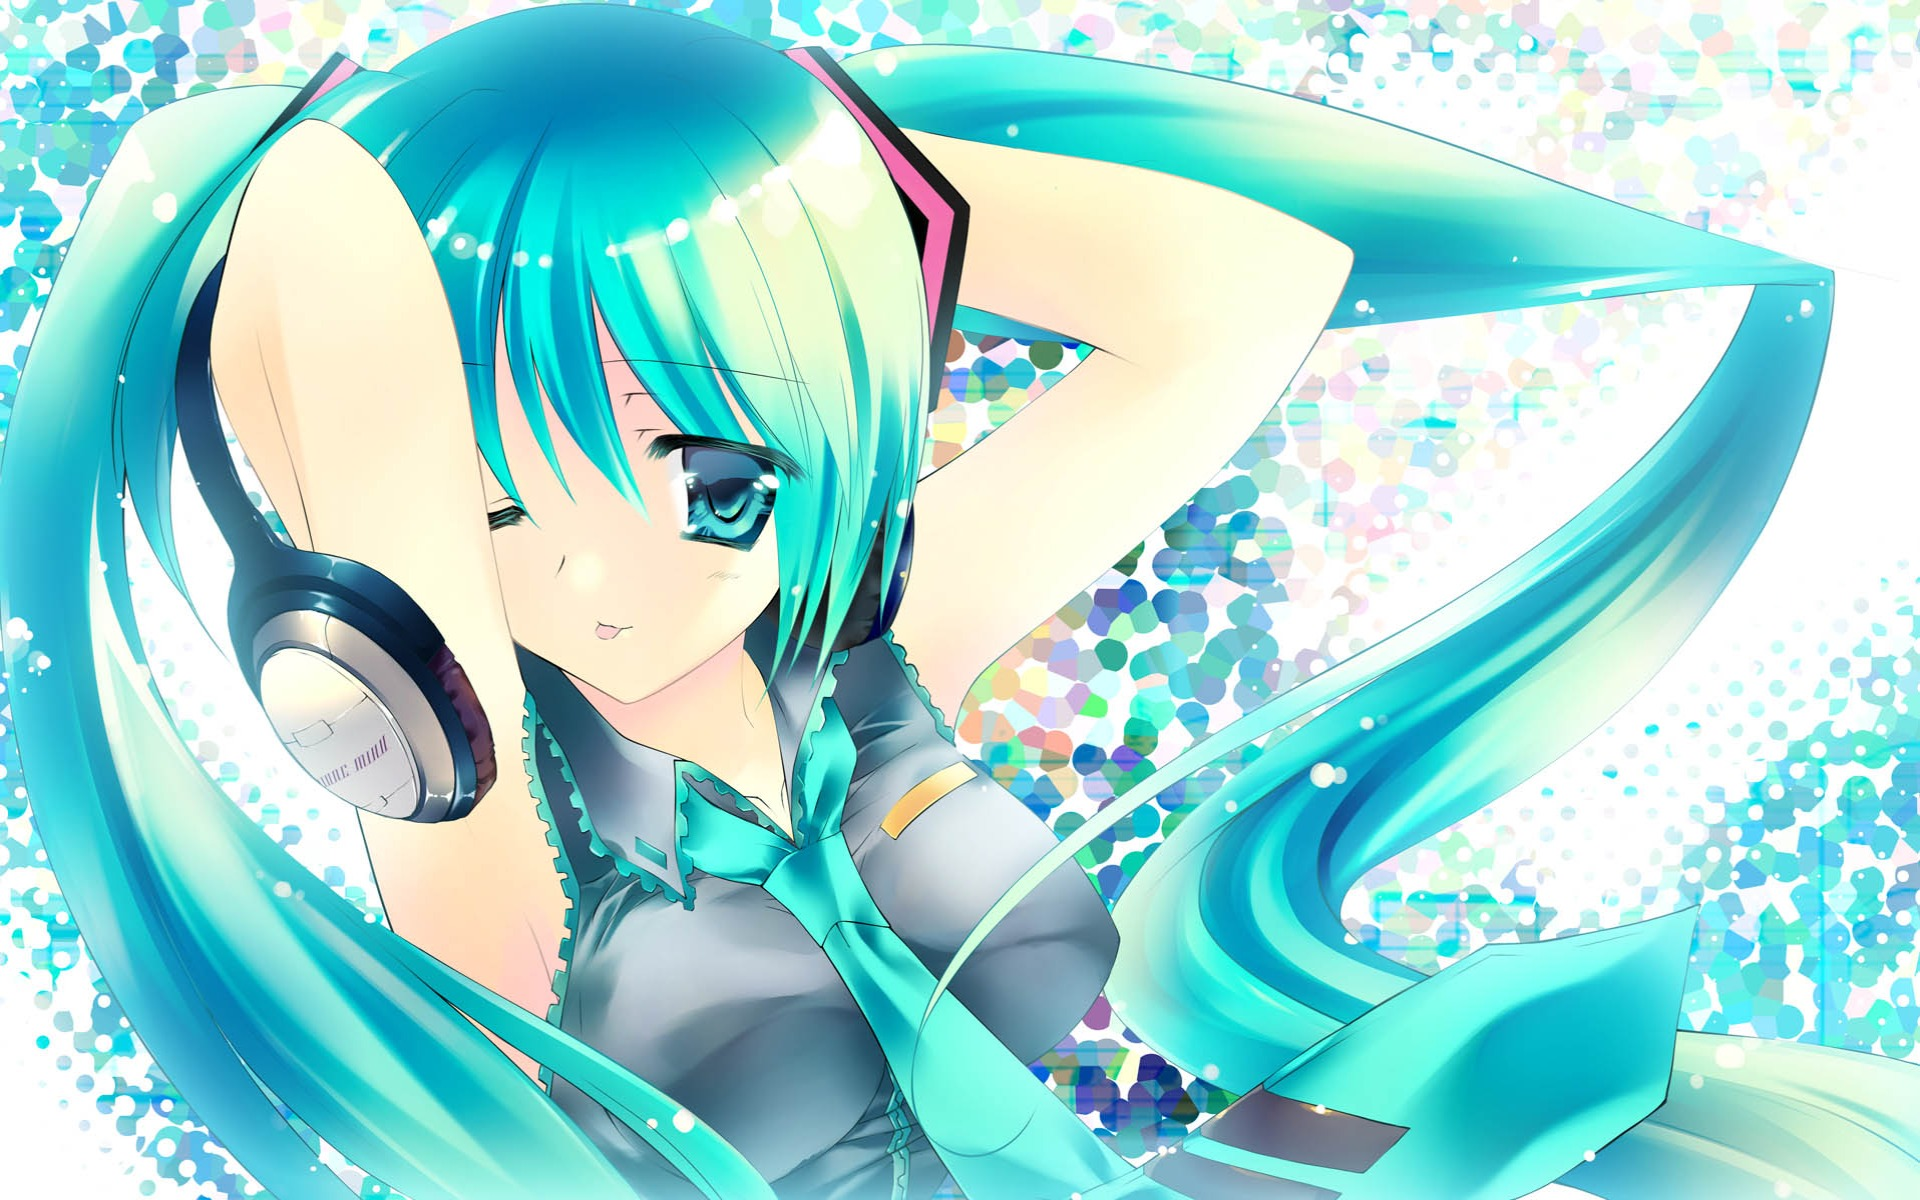 Vocaloid ボカロ かわいい壁紙pc壁紙 Psp壁紙 デスクトップ壁紙